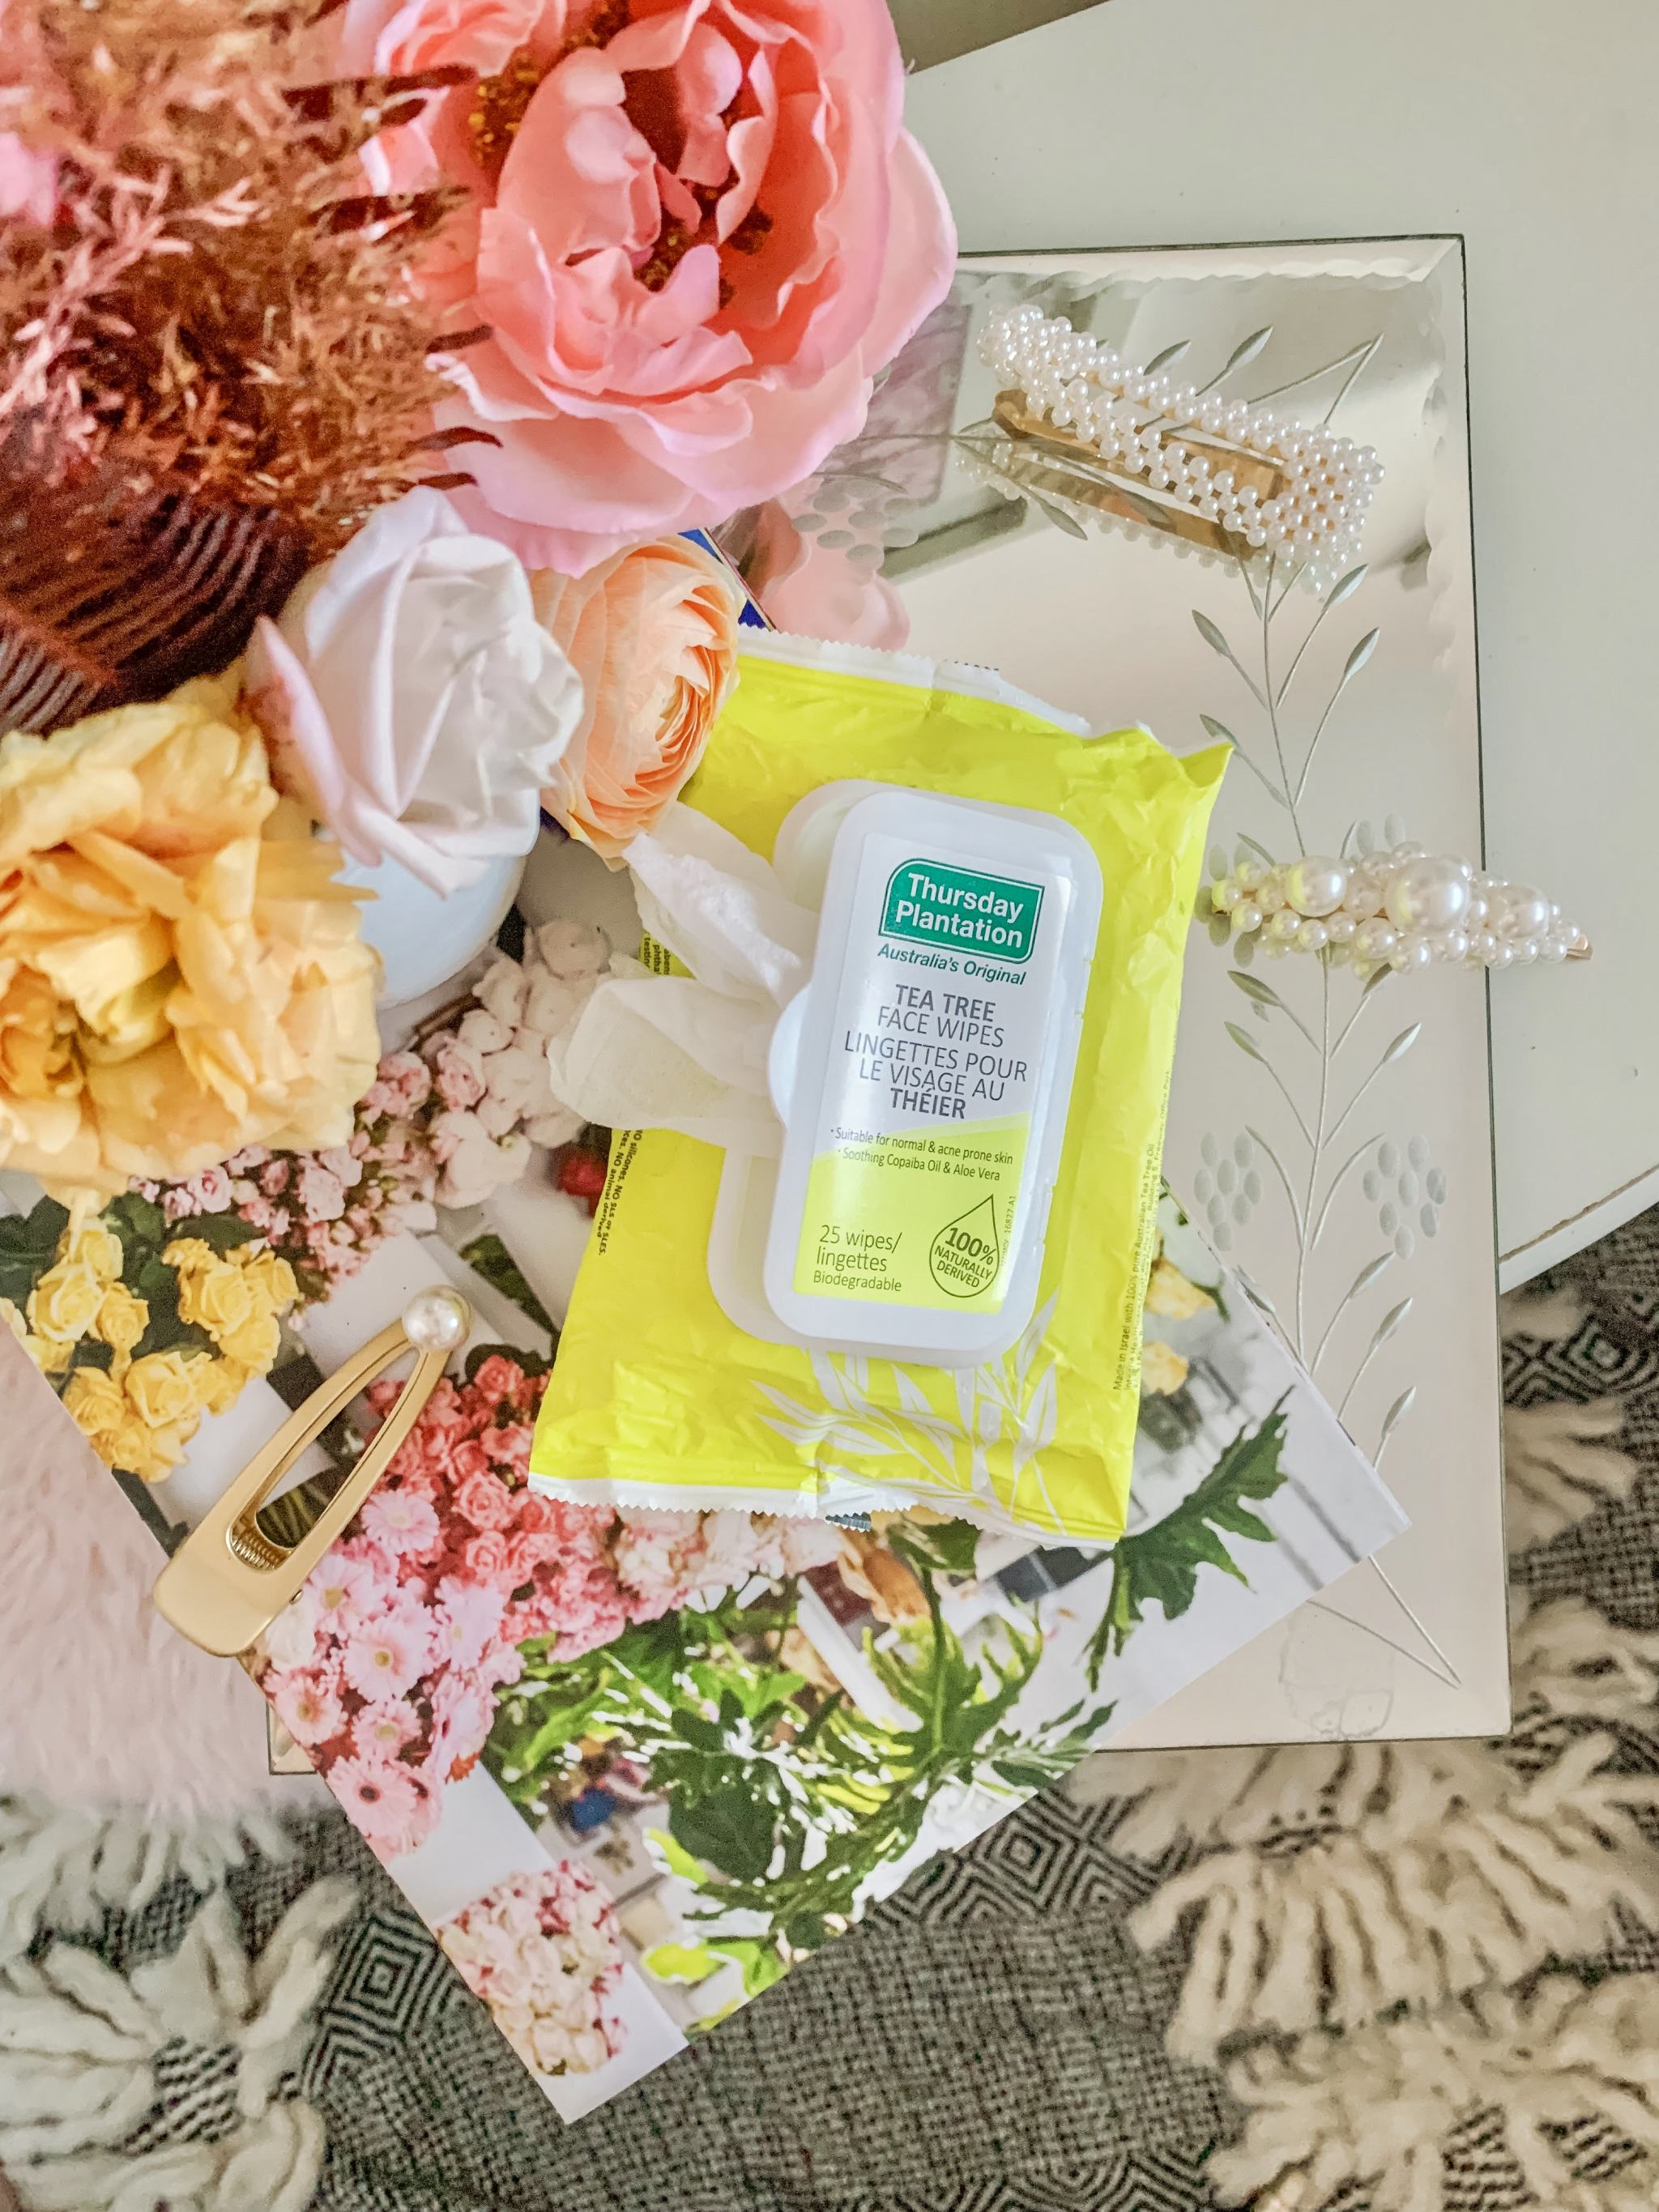 Bijuleni - 5 Products that Rejuvenate Skin Overnight - Thursday Plantation Facial Wipes